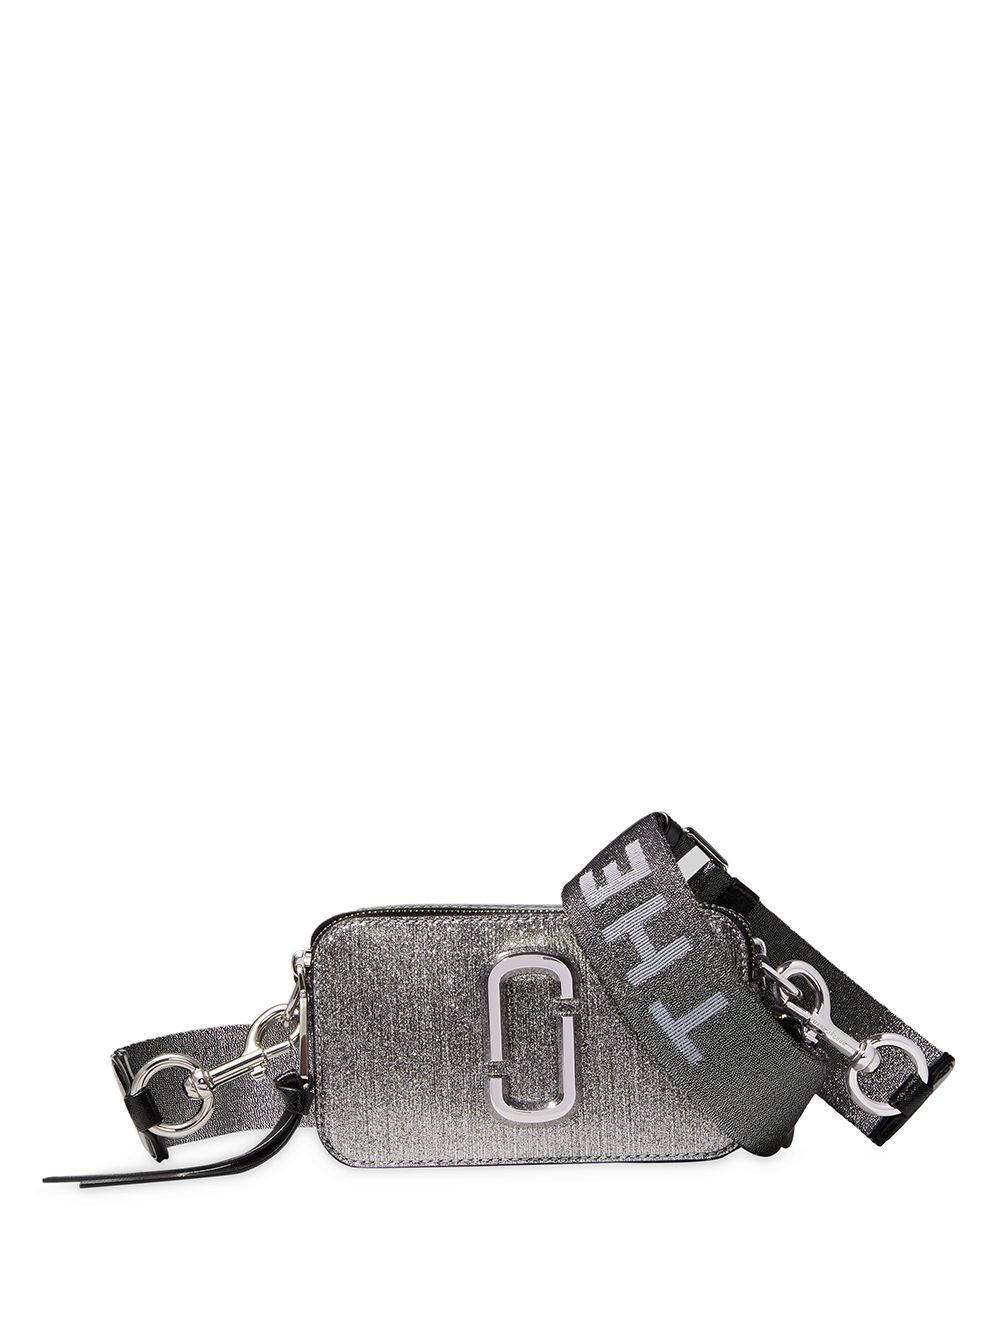 Snapshot Glittered Leather Crossbody Bag